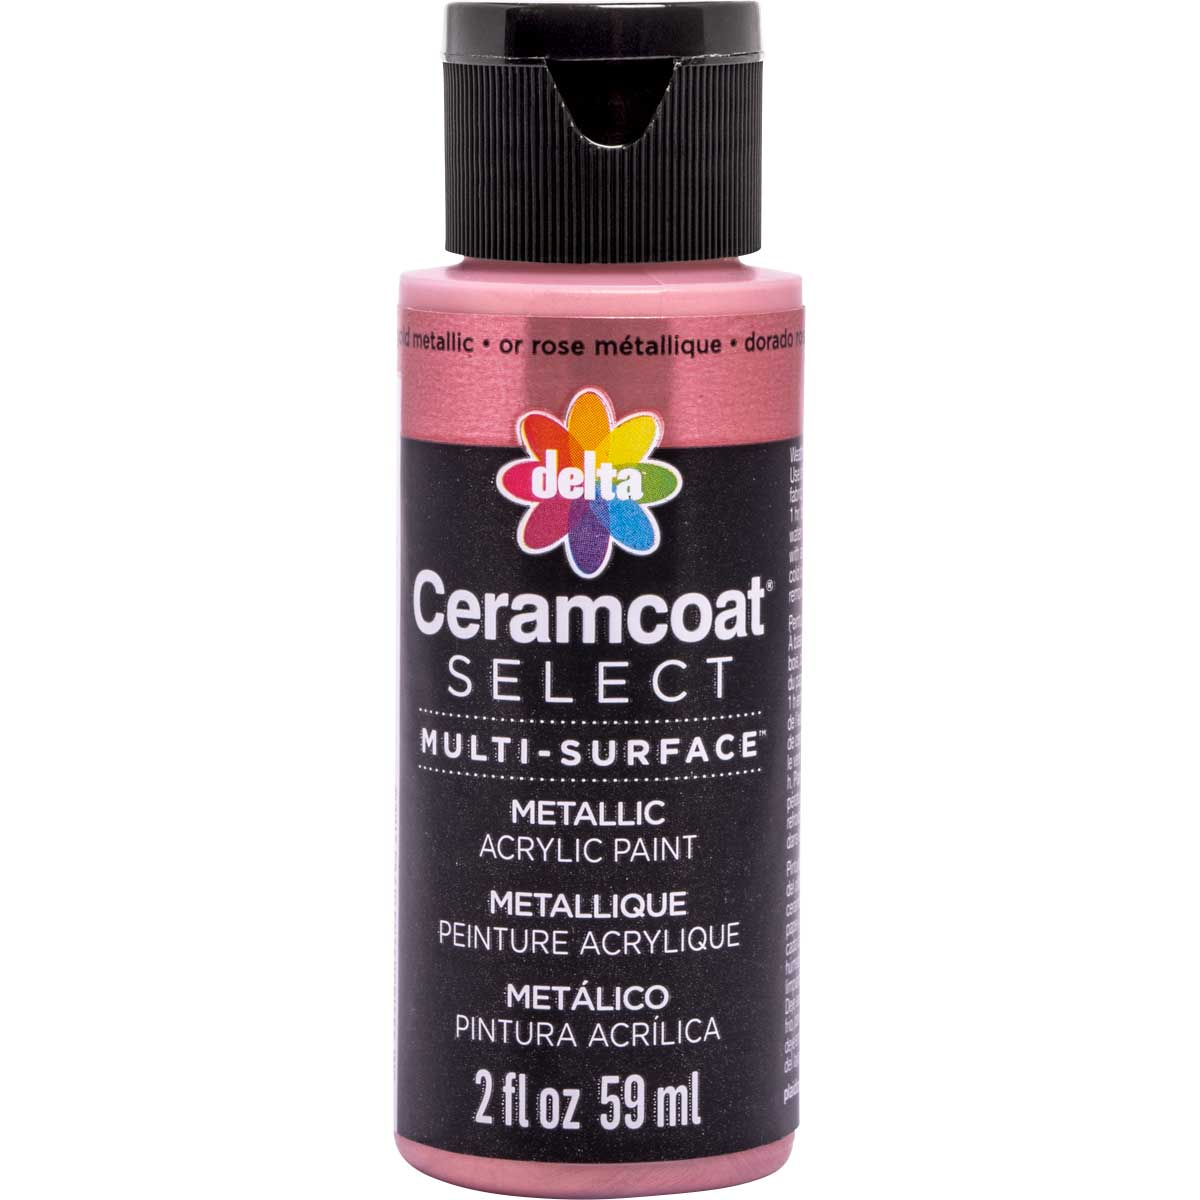 Delta Ceramcoat ® Select Multi-Surface Acrylic Paint - Metallic - Rose Gold, 2 oz. - 04111